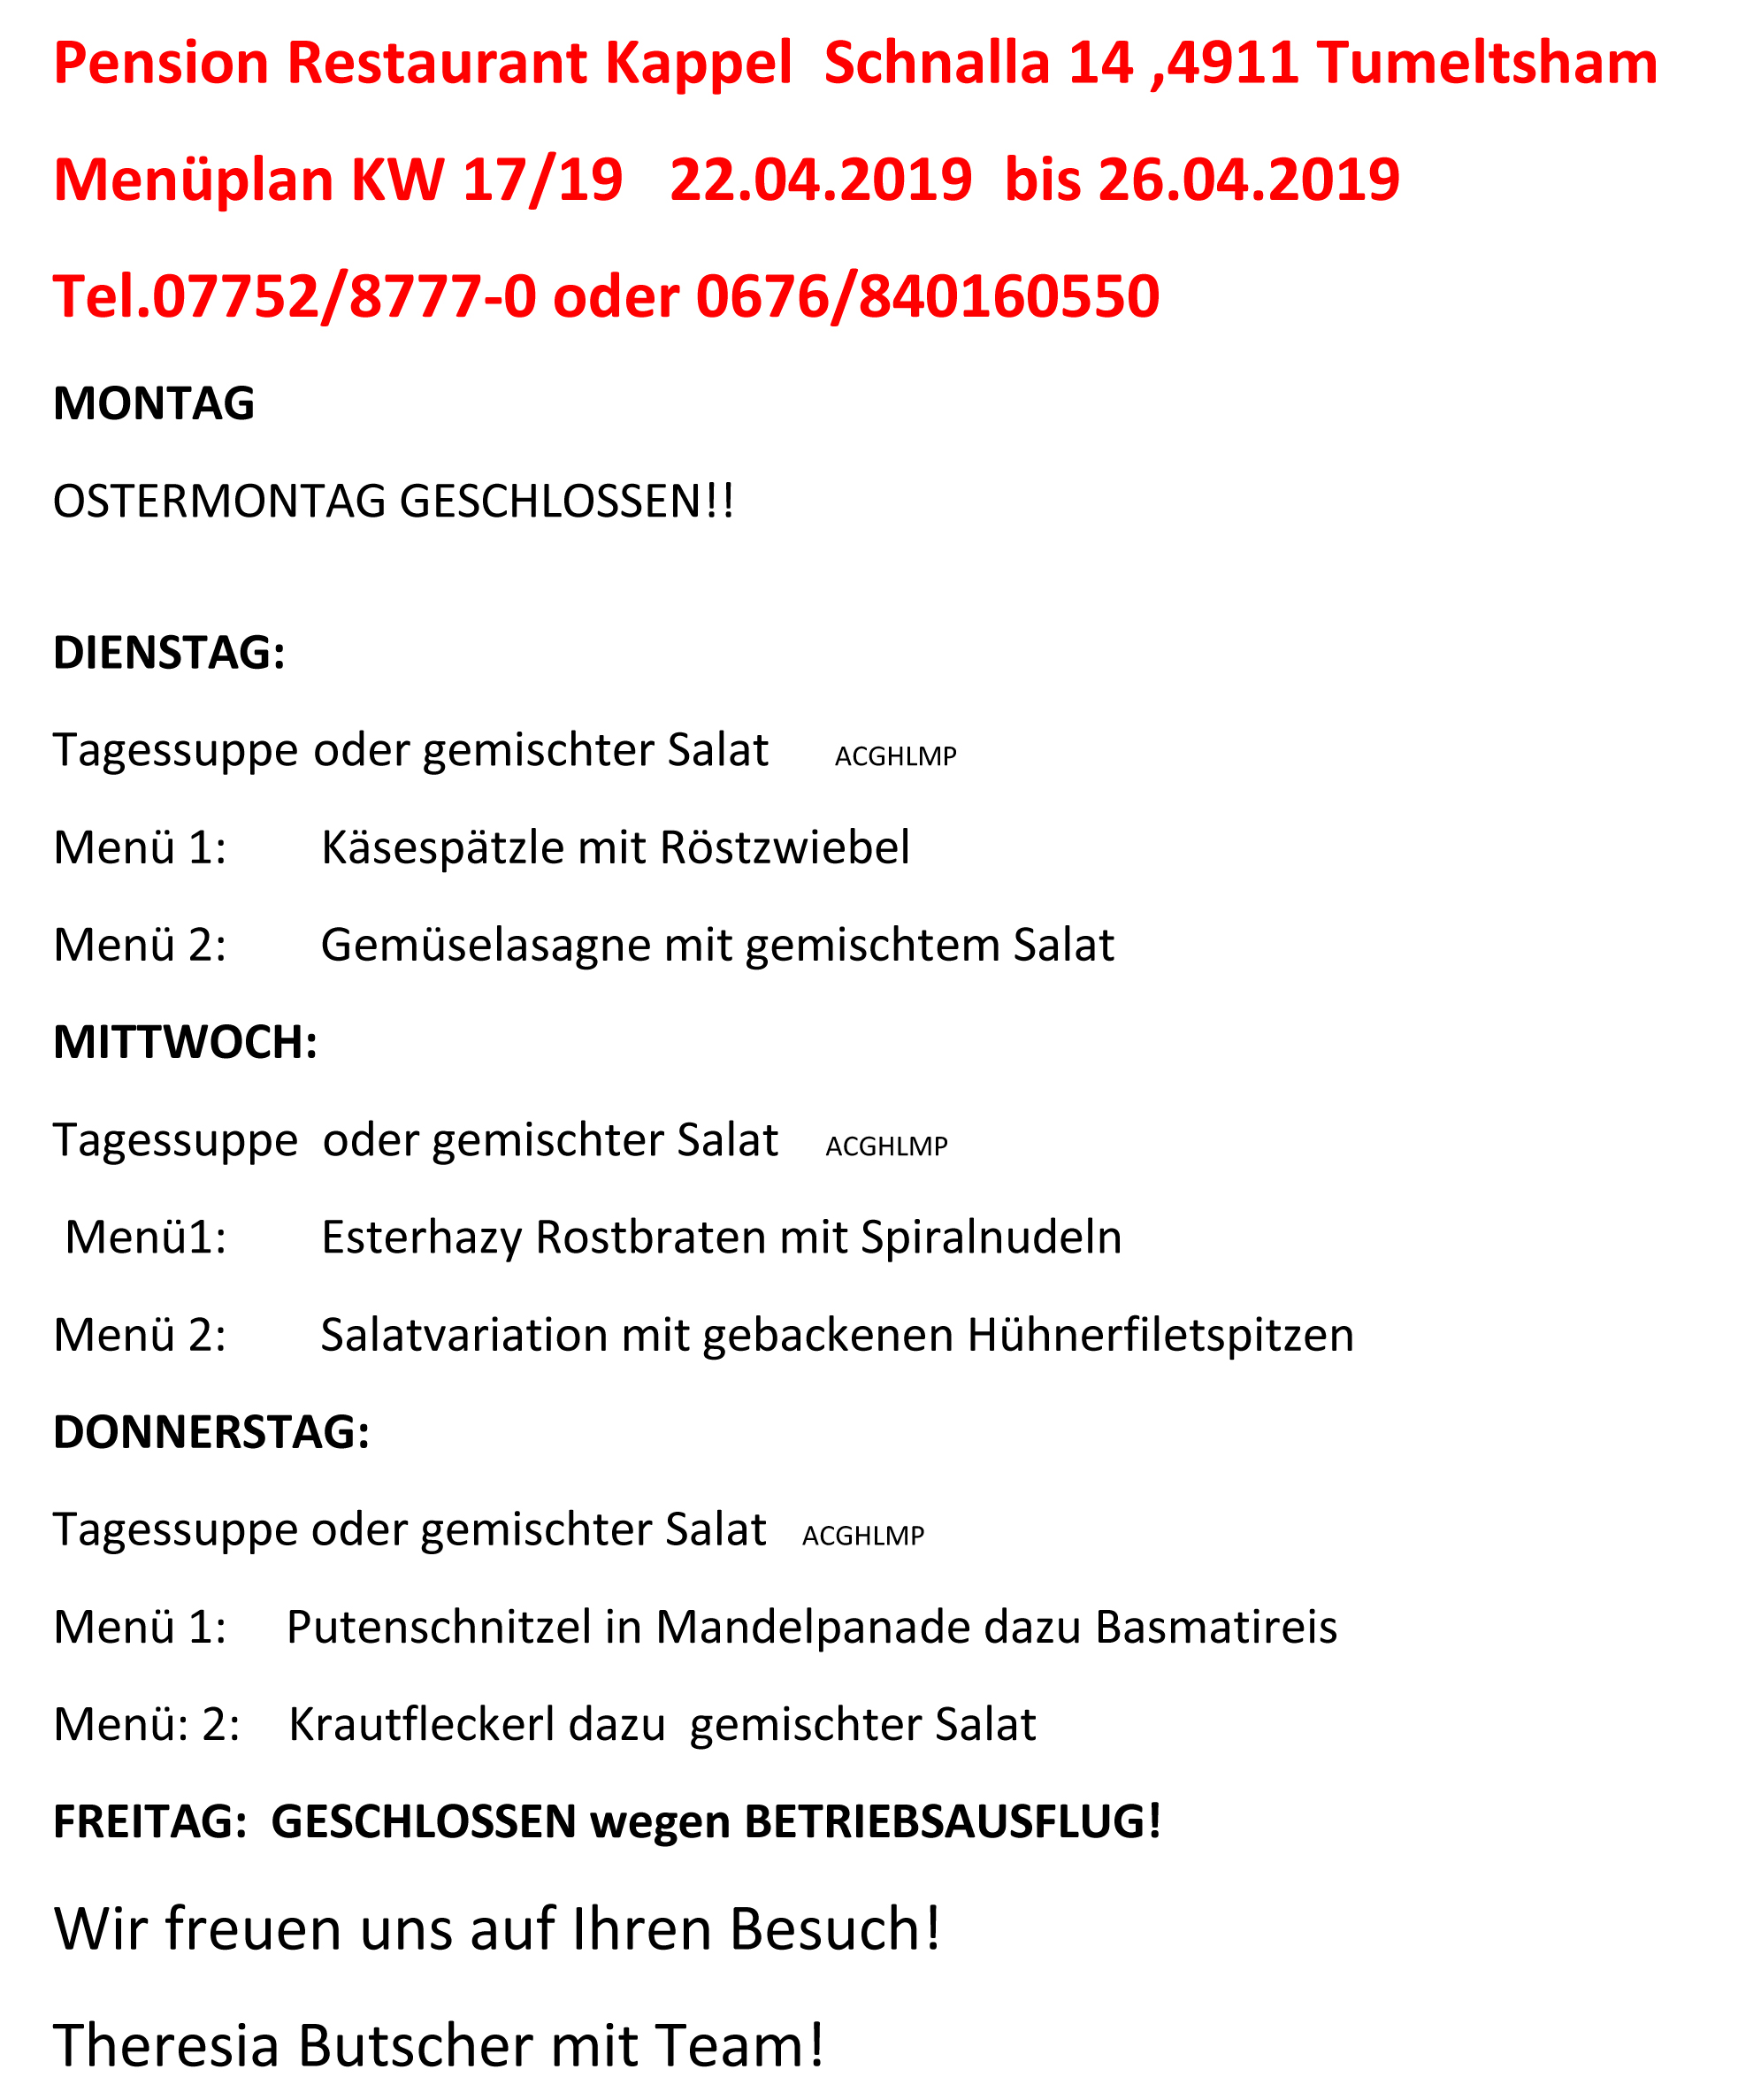 Menüplan KW 17-19docx (1)